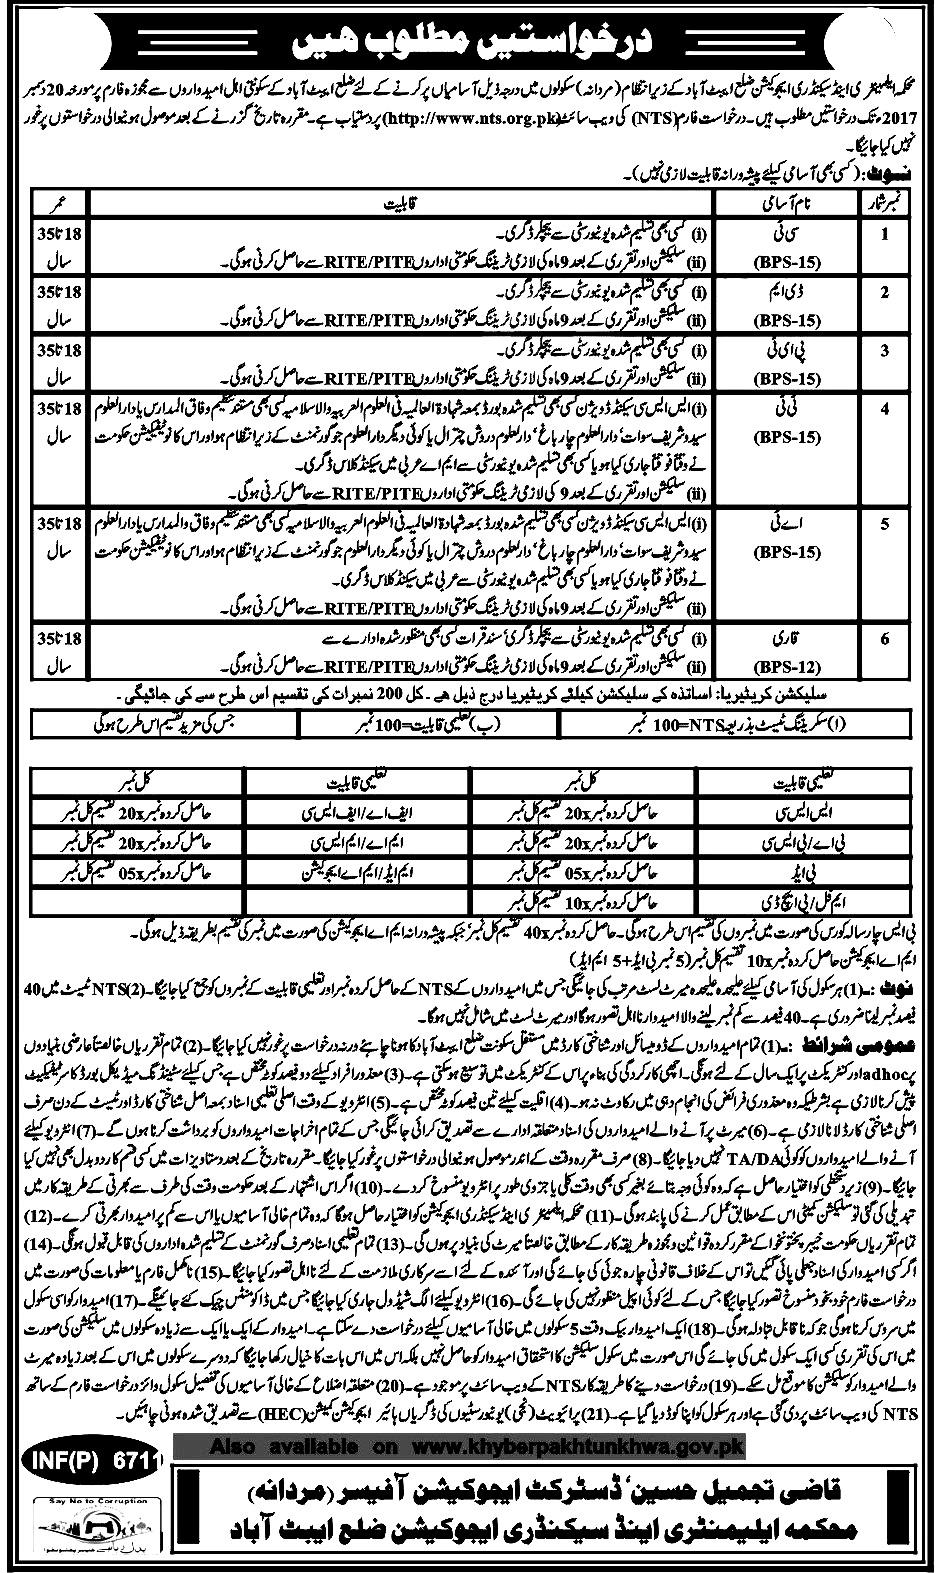 Government of Khyber Paktunkhwa (KPK) announced educators jobs